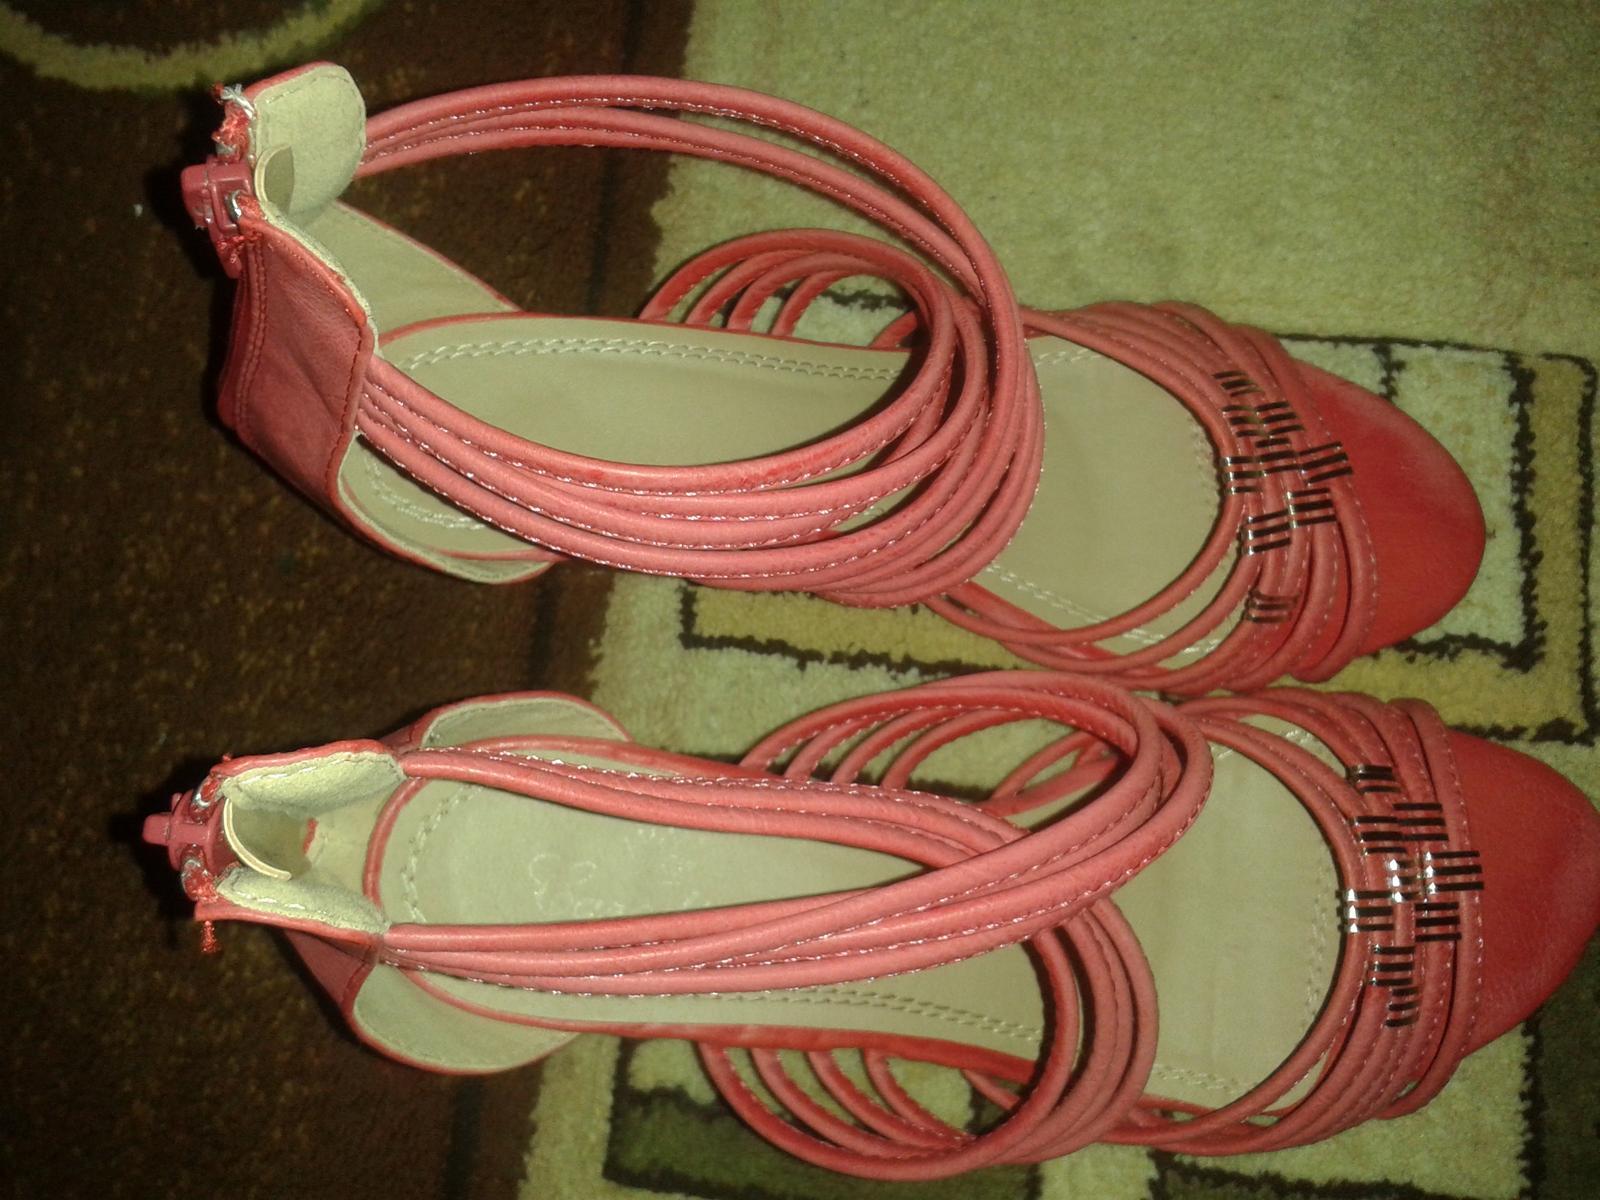 cervene sandale na platforme - Obrázok č. 3